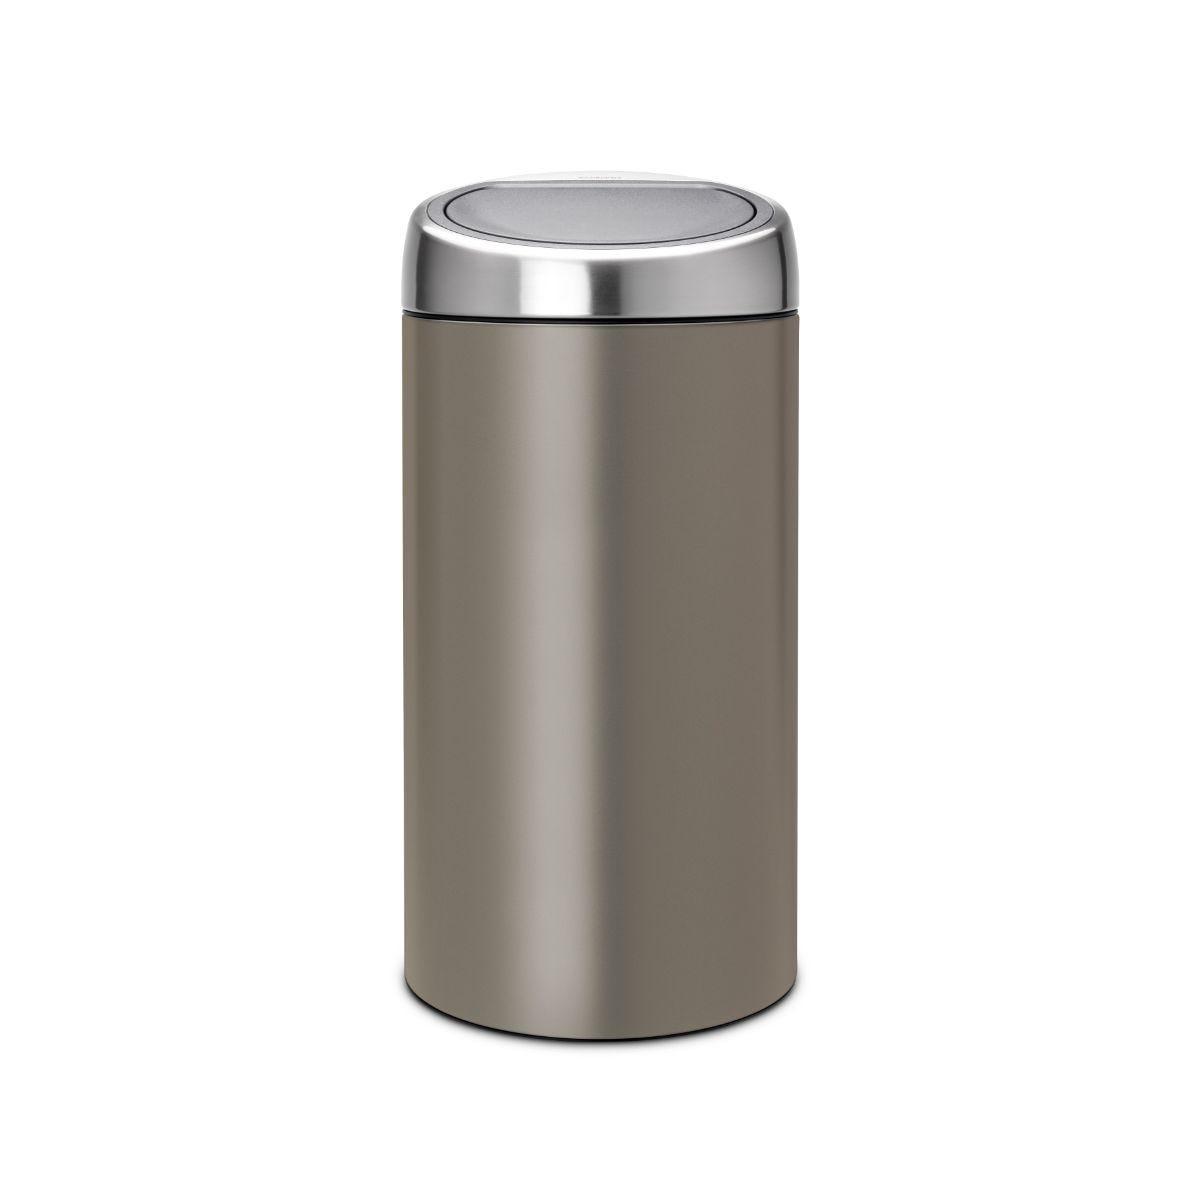 Brabantia 2 x 20L New Recycle Touch Bin - Platinum